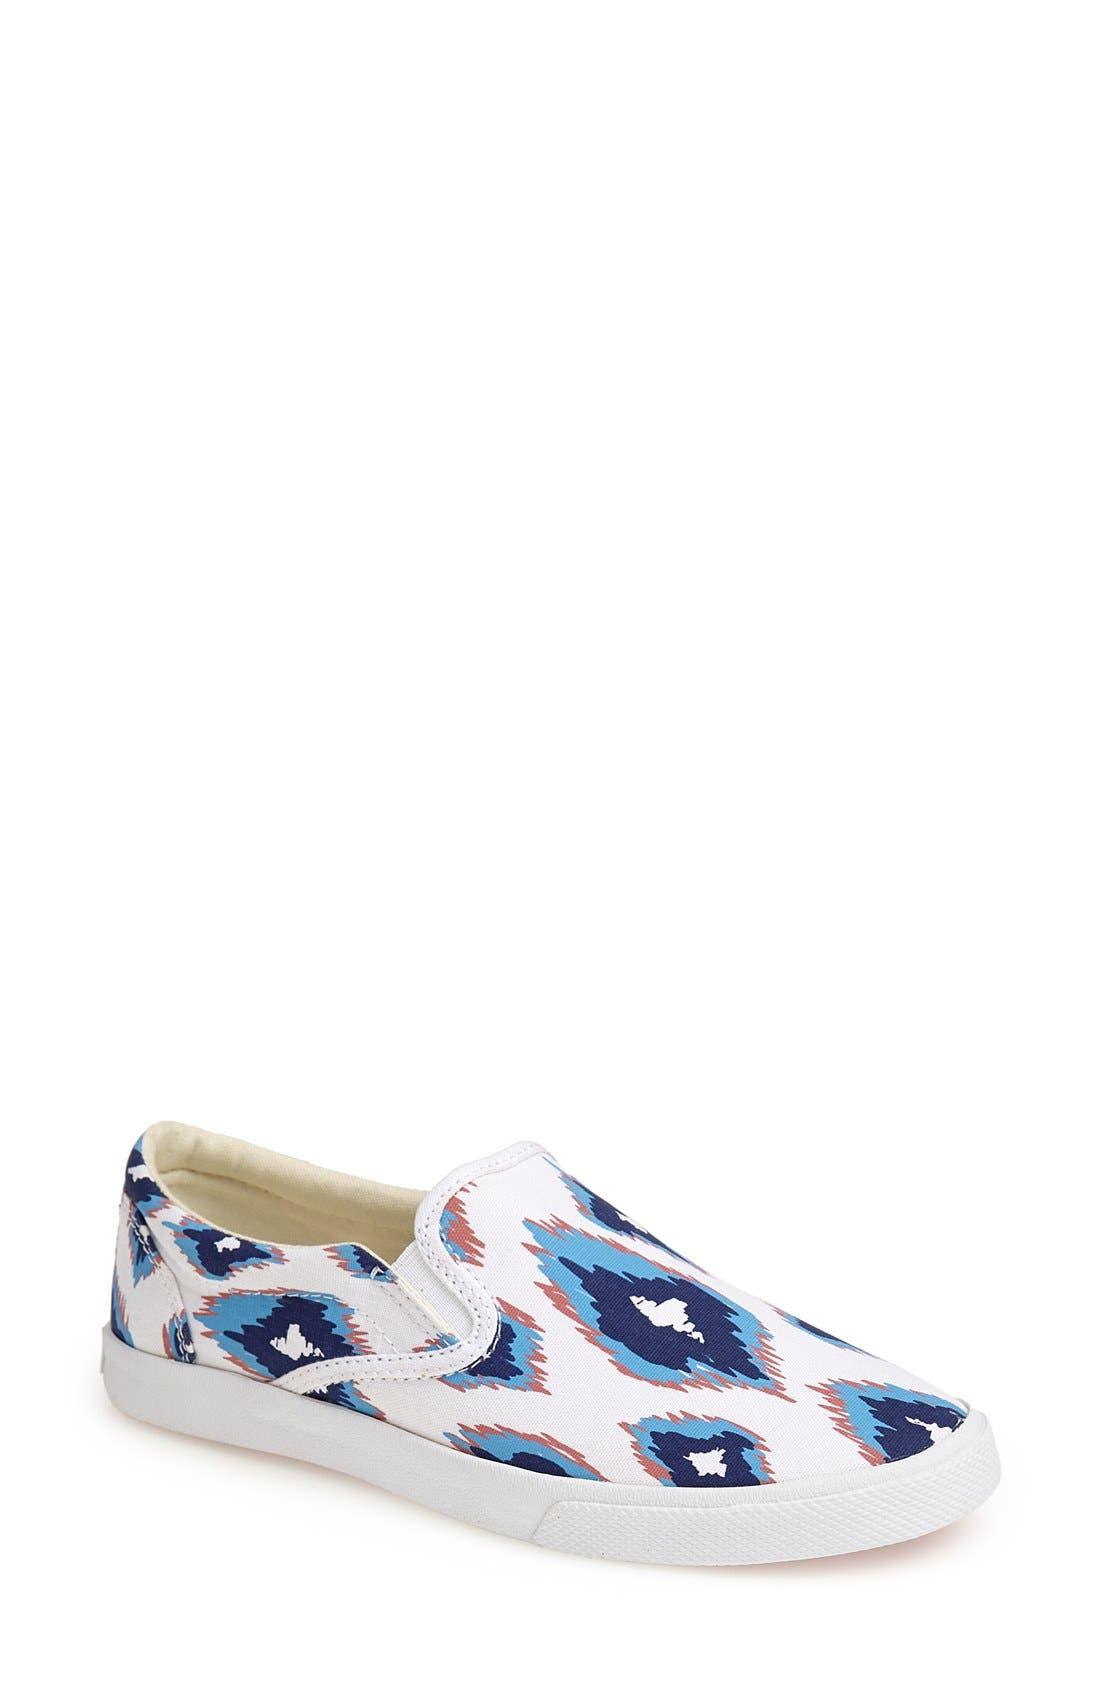 Main Image - BucketFeet 'Splash' Slip-On Sneaker (Women)